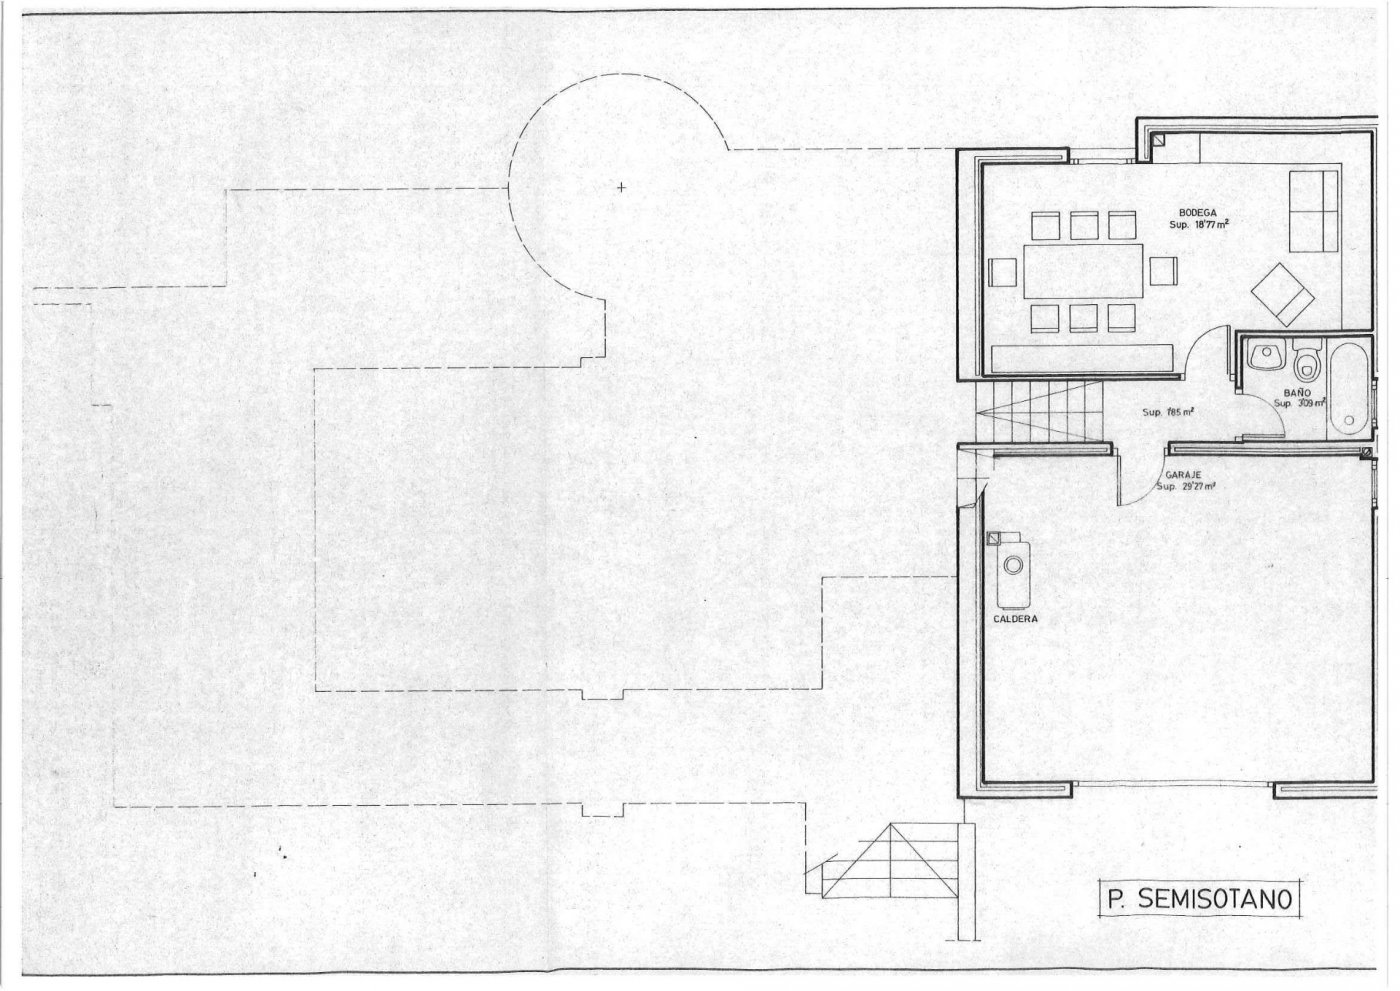 Parcela lateral de 600m2 con casa de 267m2 útiles  de vivienda mas garaje anejo de 45m2 út - imagenInmueble35